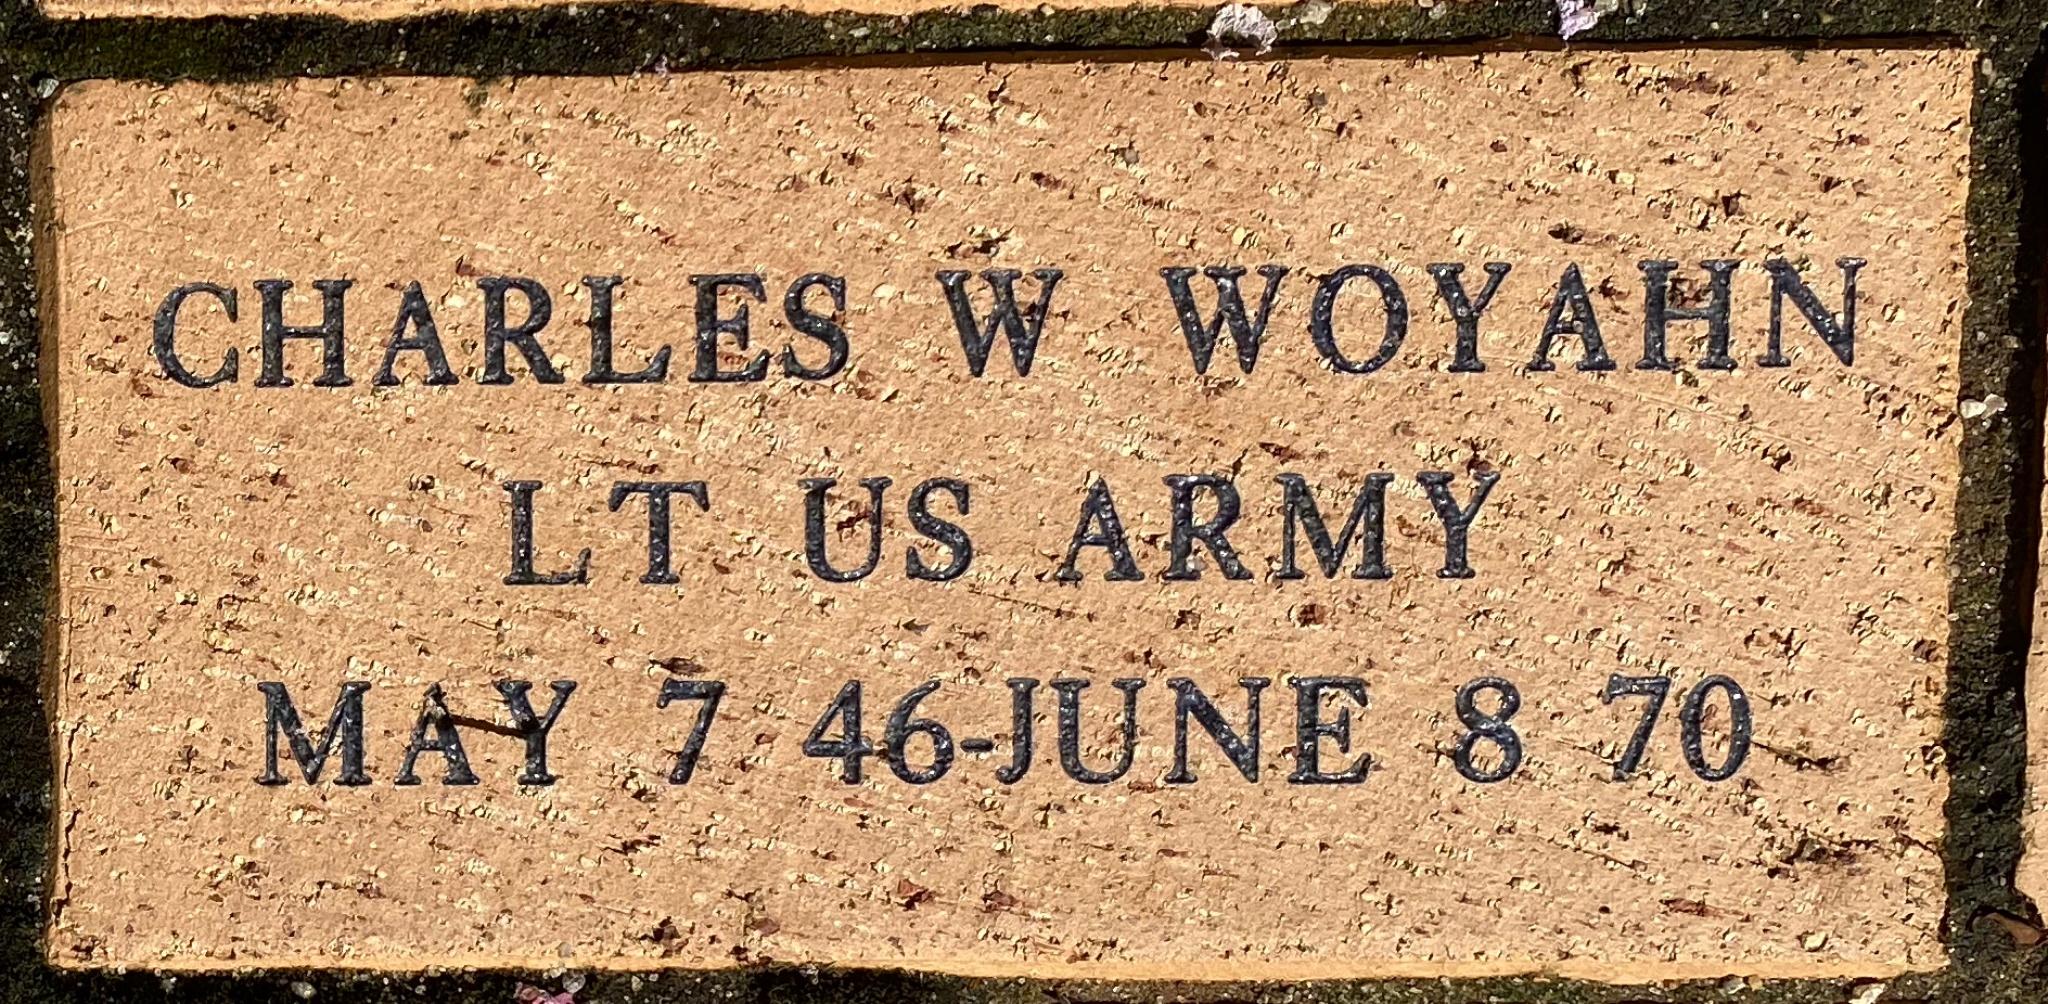 CHARLES W WOYAHN LT US ARMY MAY 7 46-JUNE 8 70